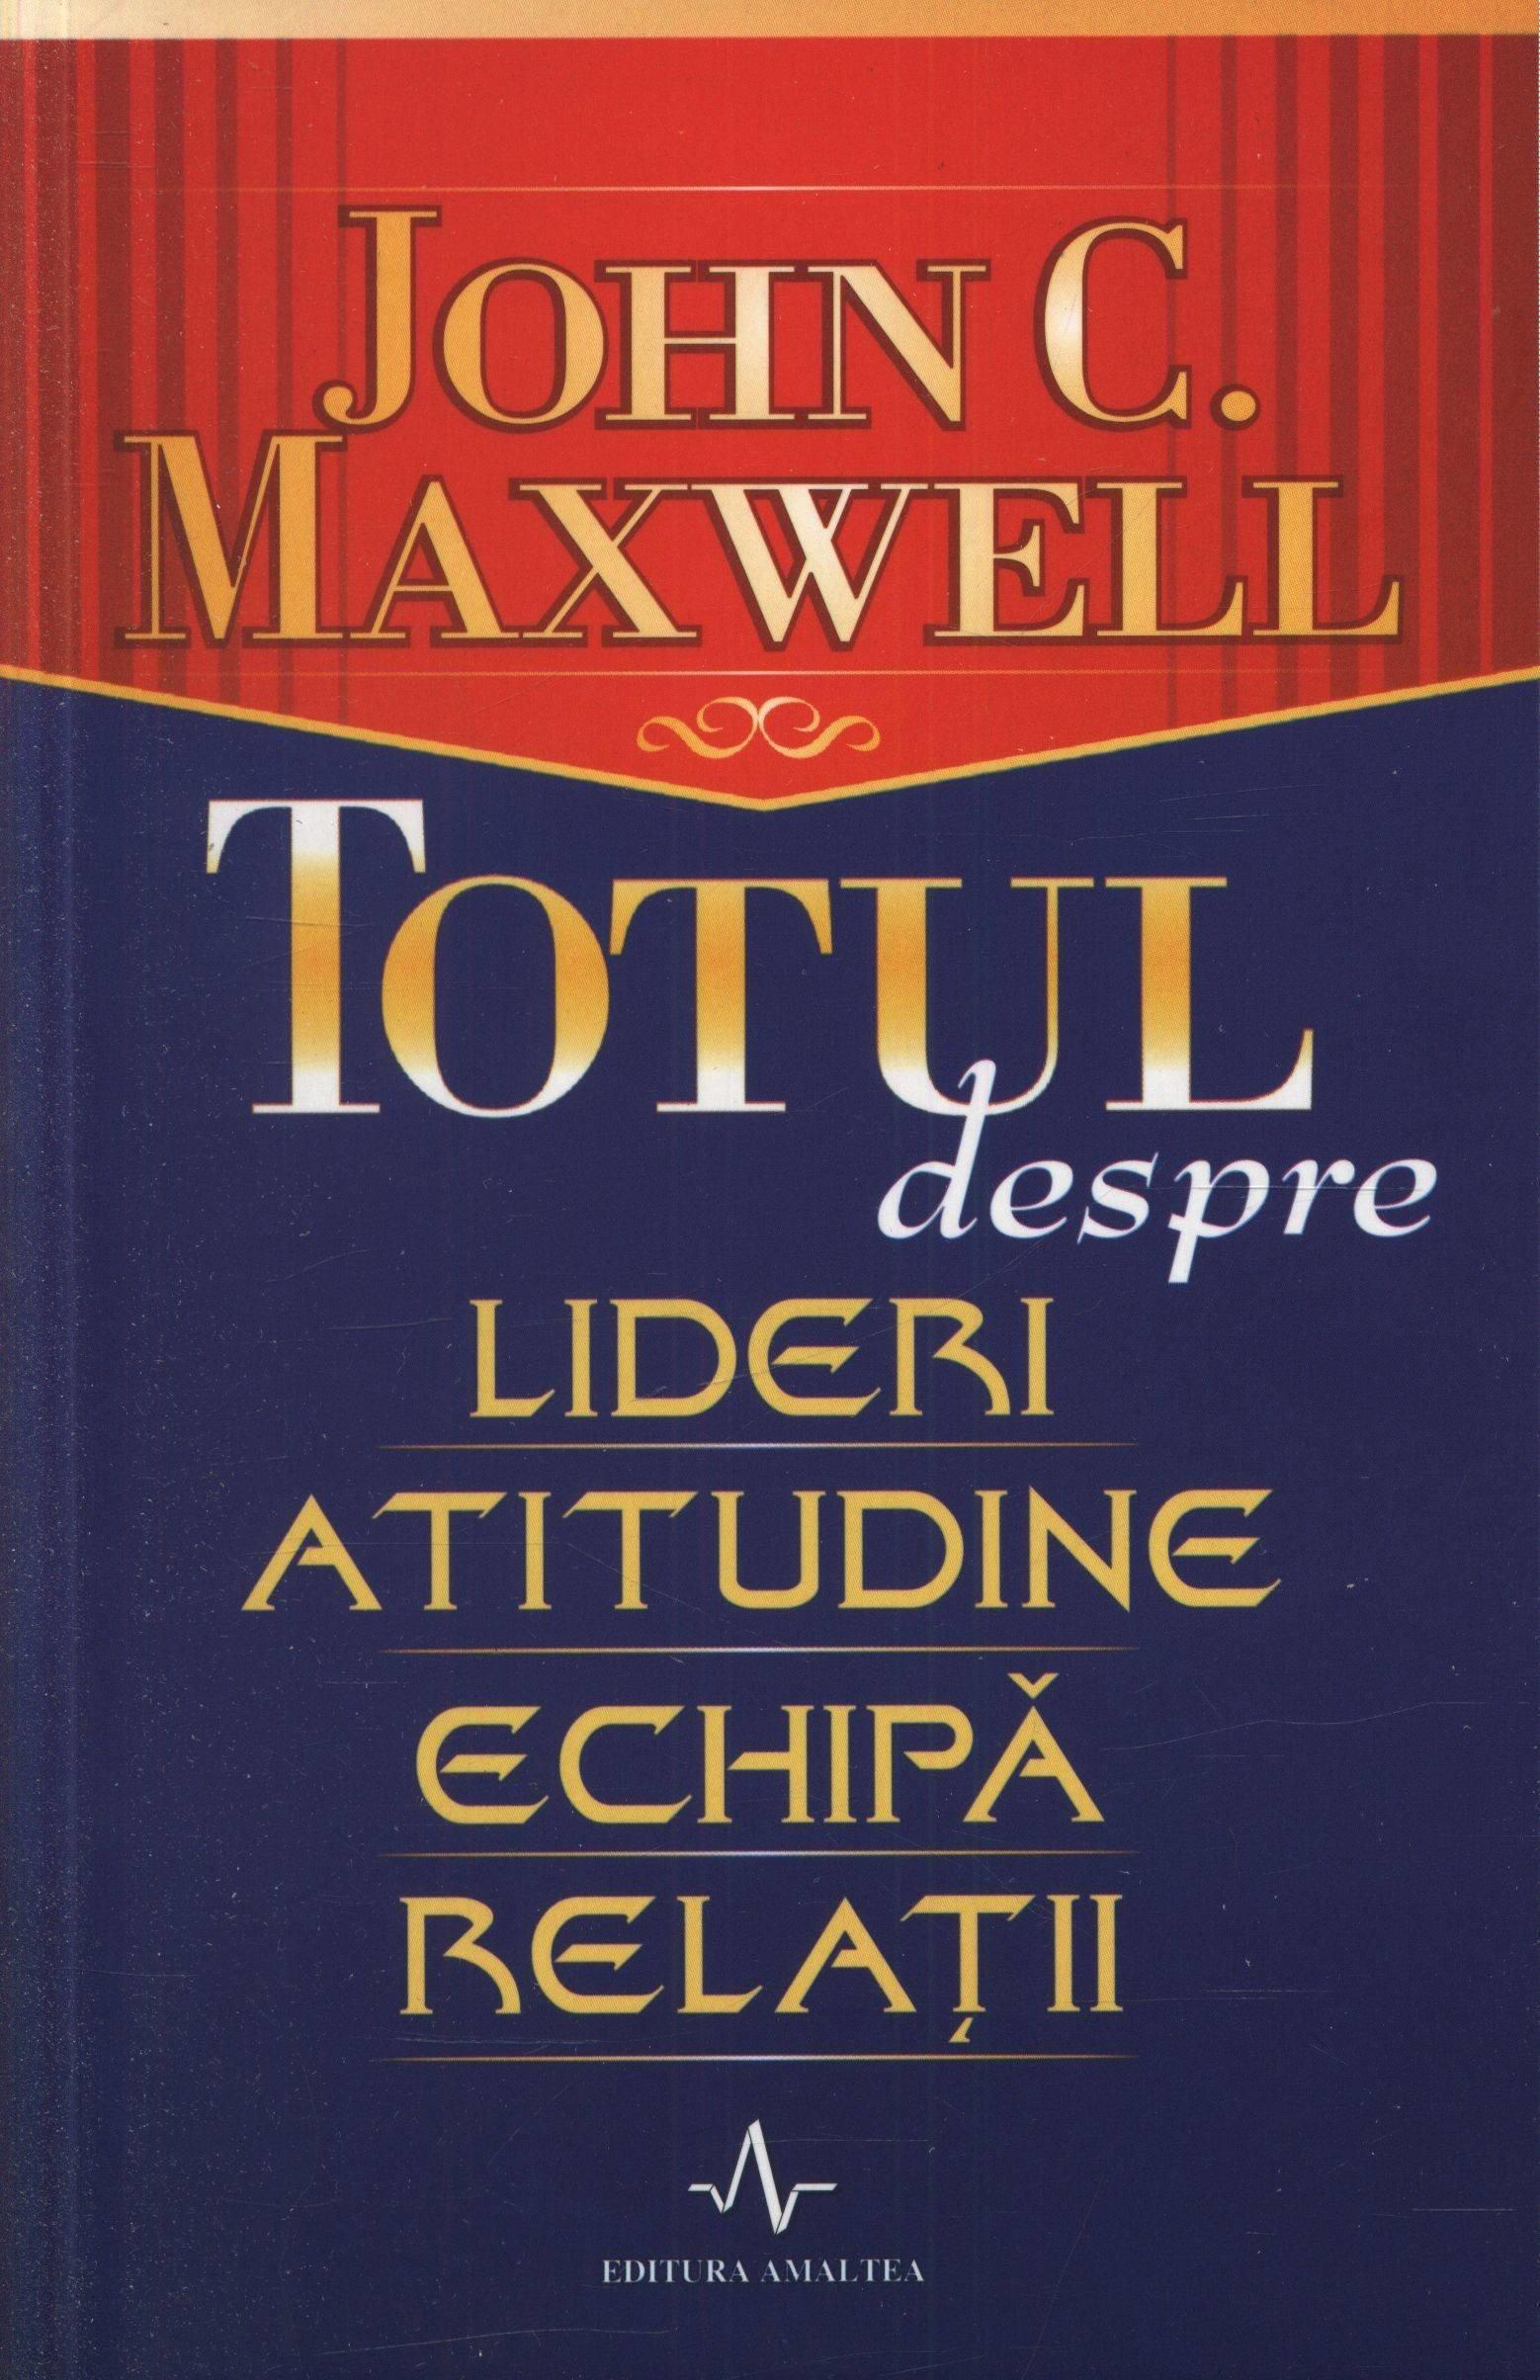 John C. Maxwell - Totul despre lideri, atitudine, echipa, relatii -